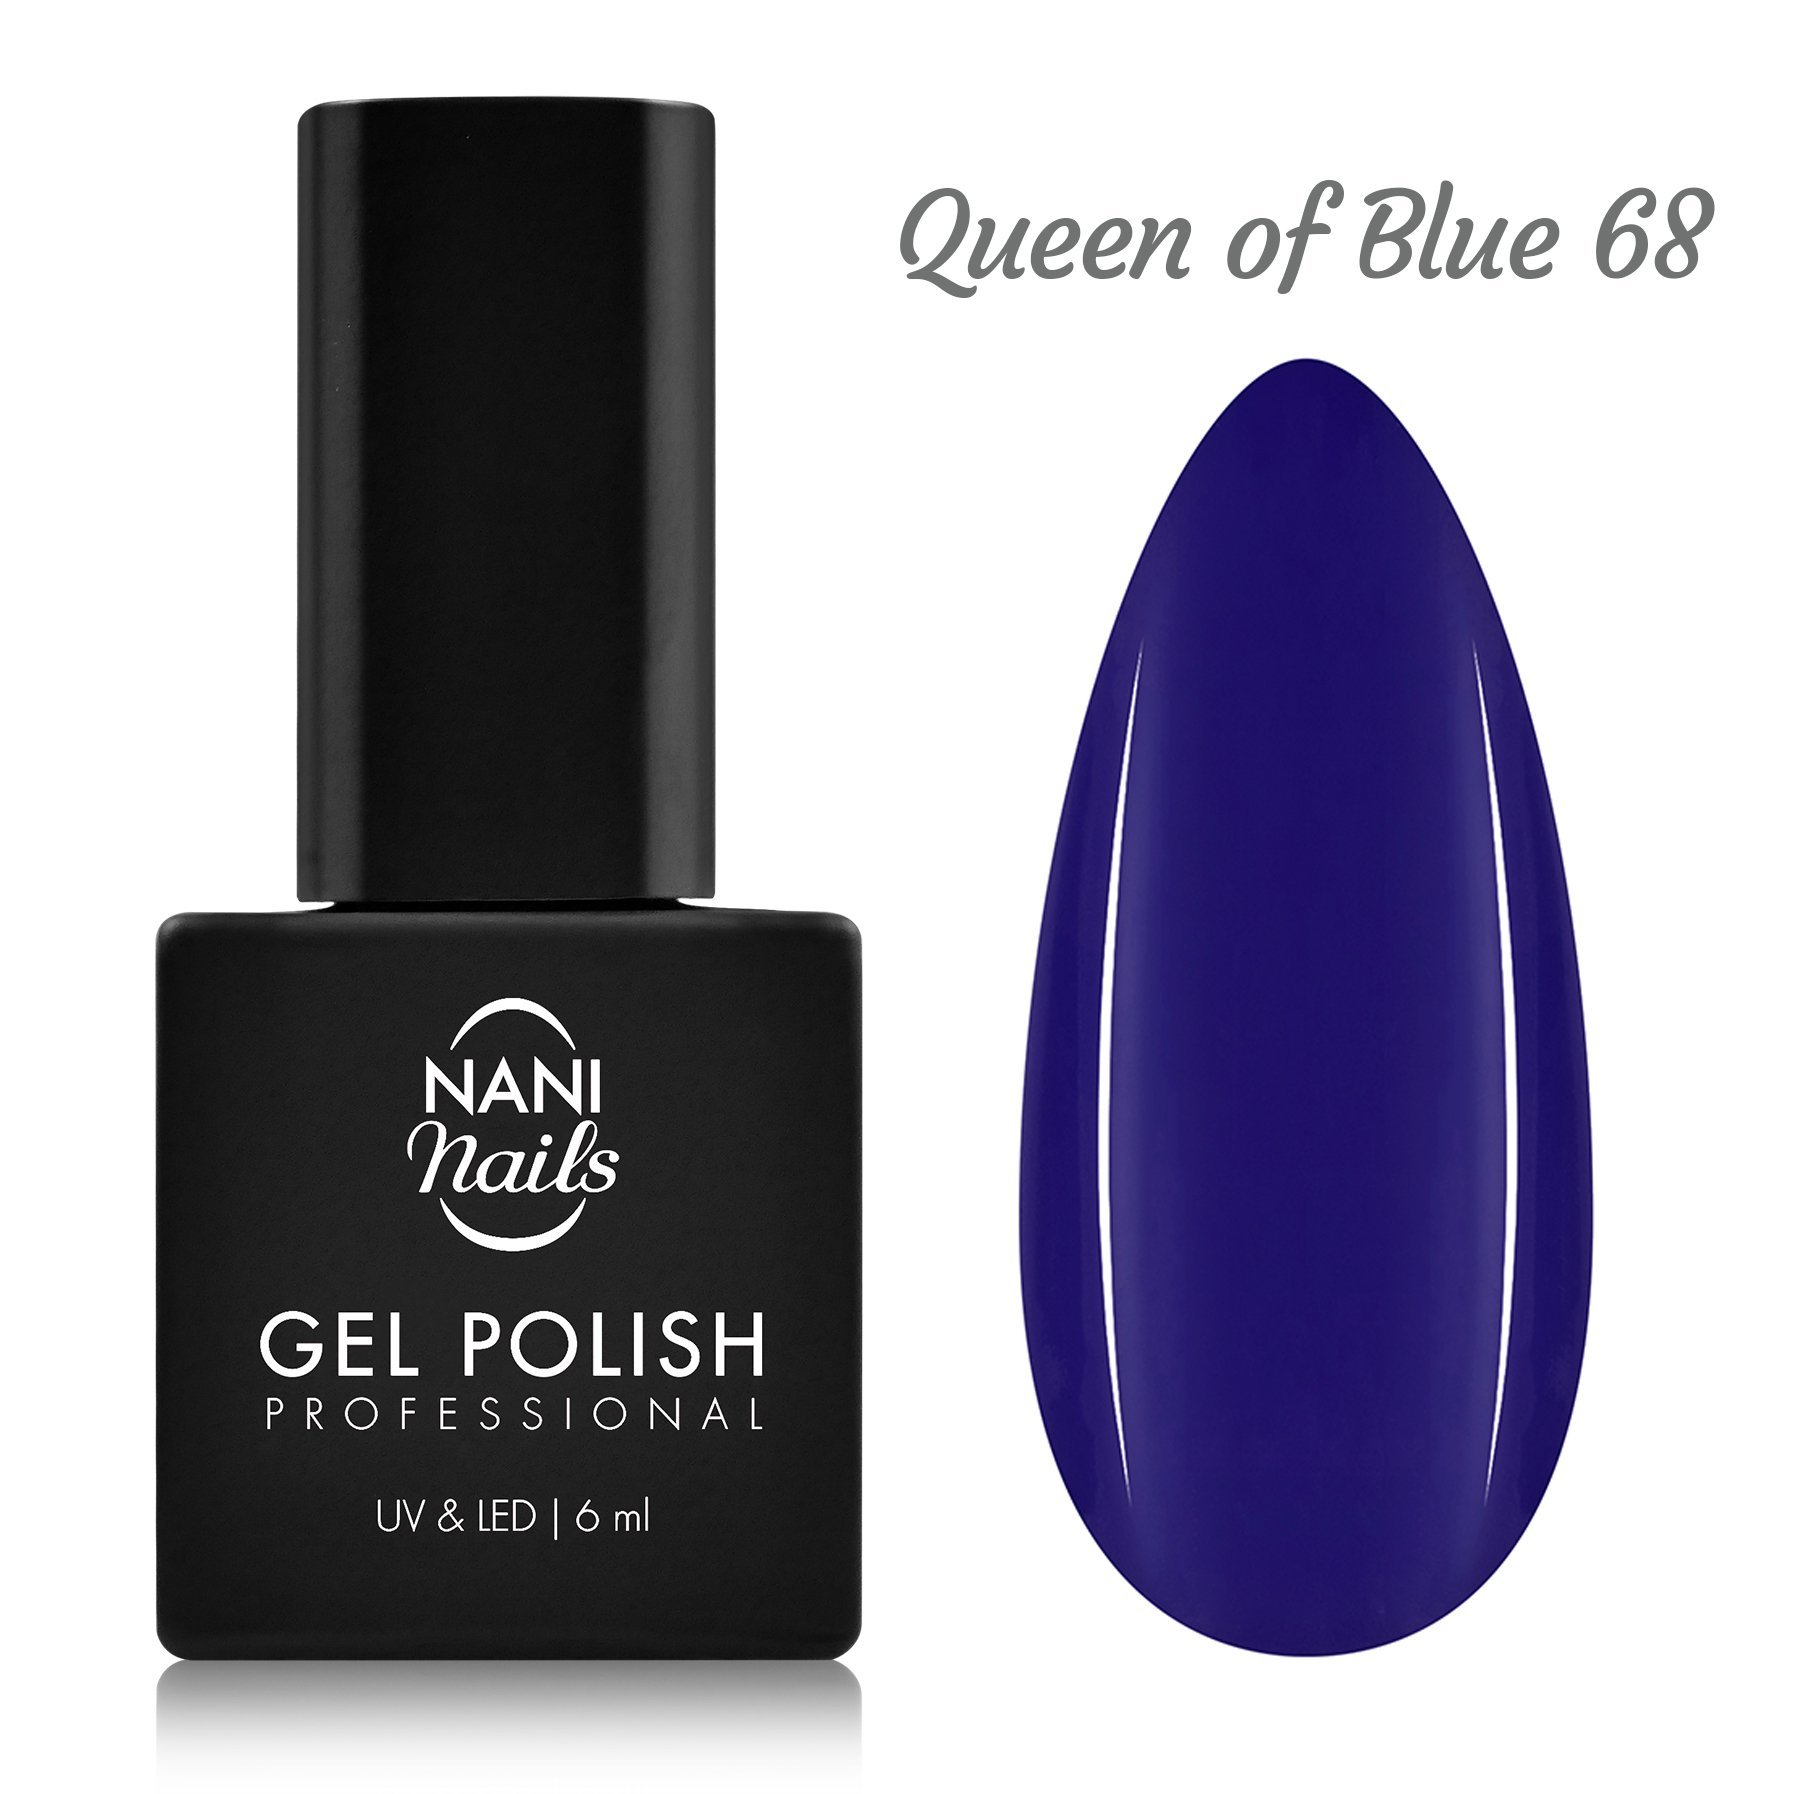 NANI gél lak 6 ml - Queen of Blue